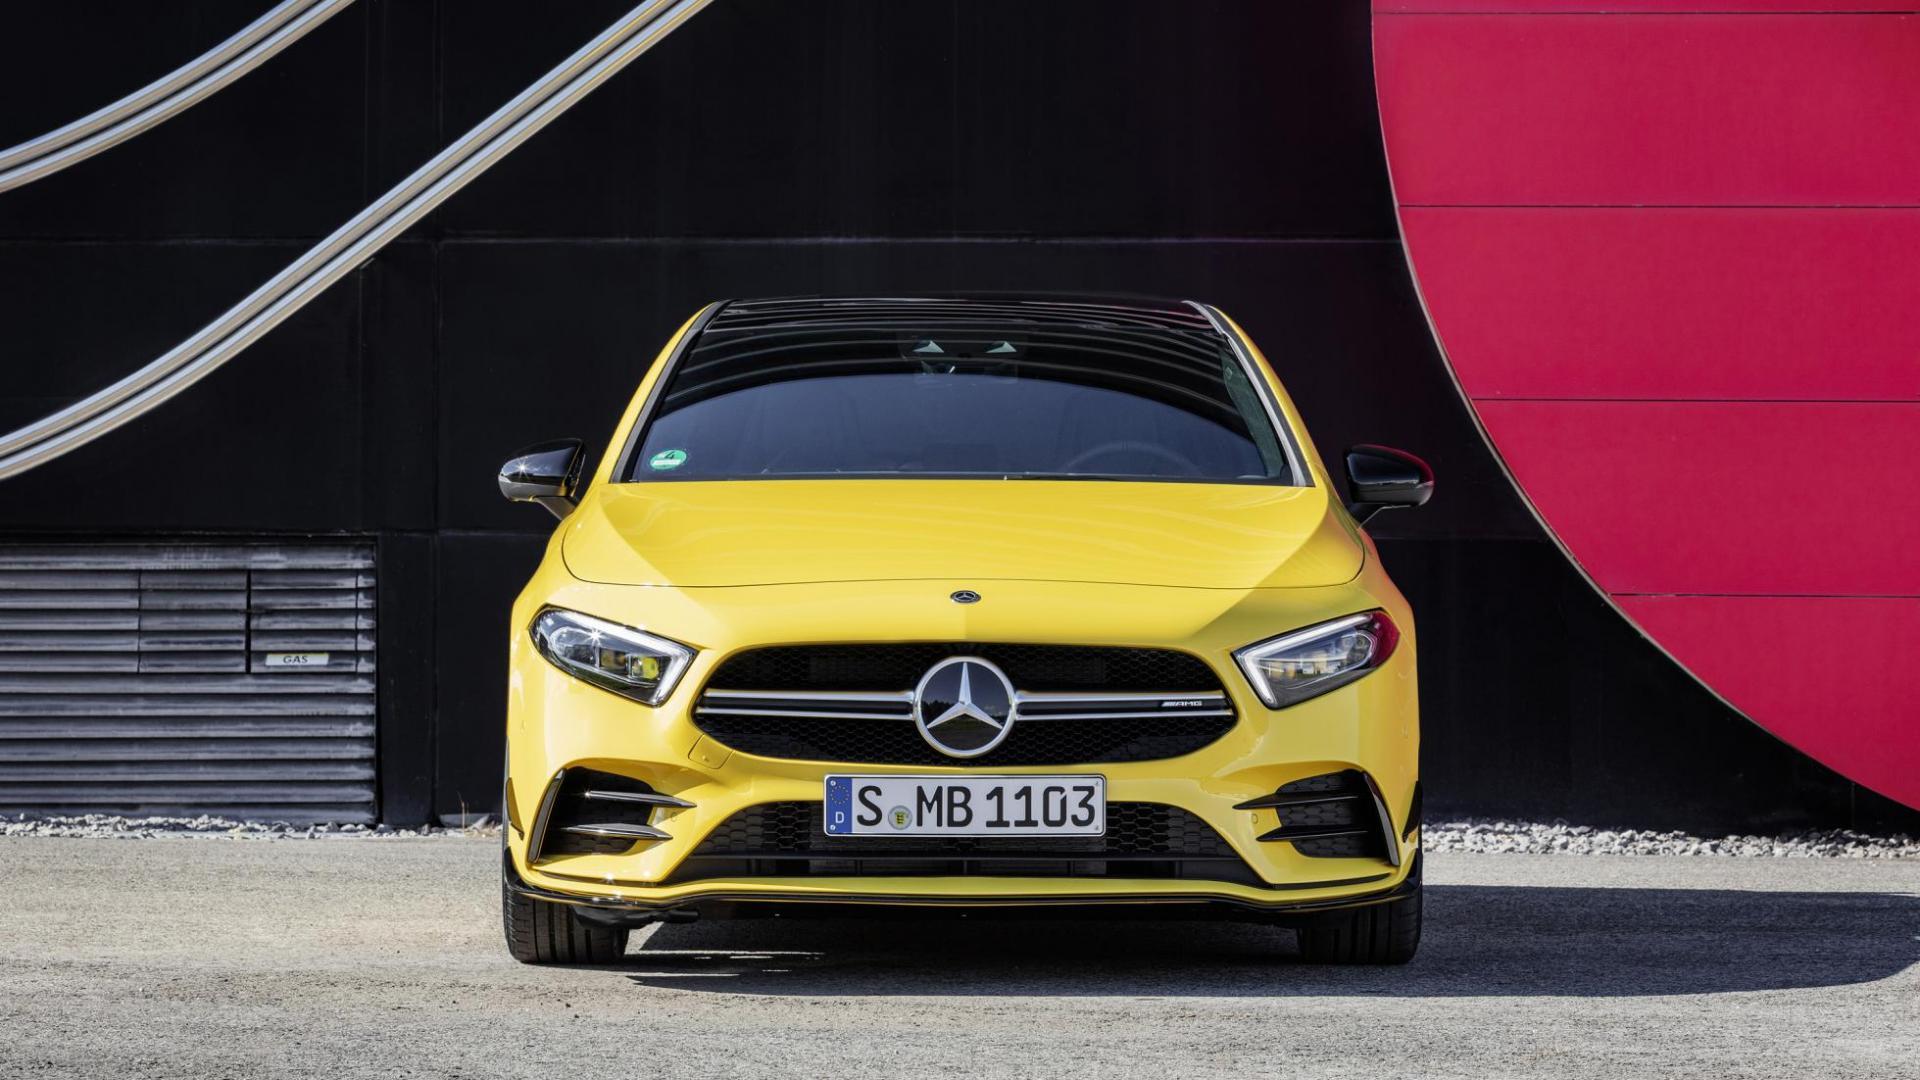 Mercedes-AMG A35 hot hatch